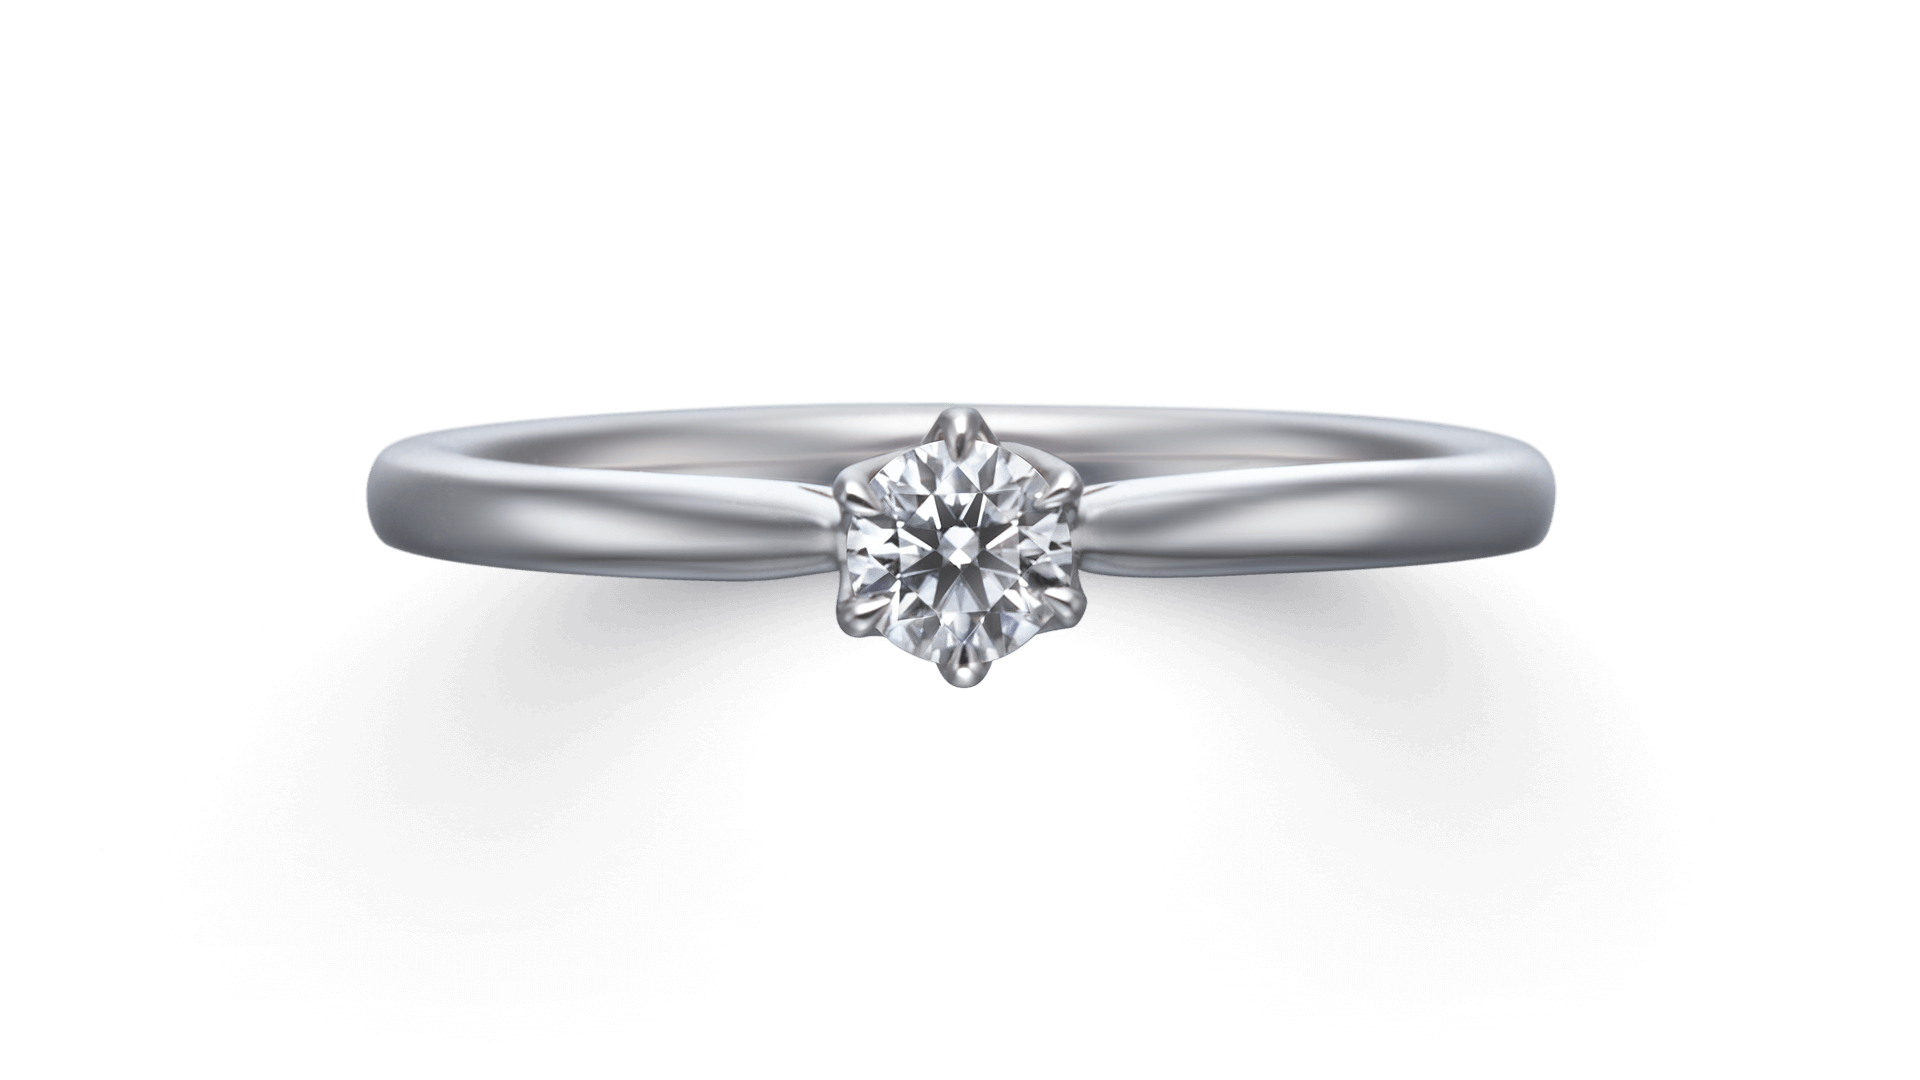 helia ヘリア | 婚約指輪サムネイル 1